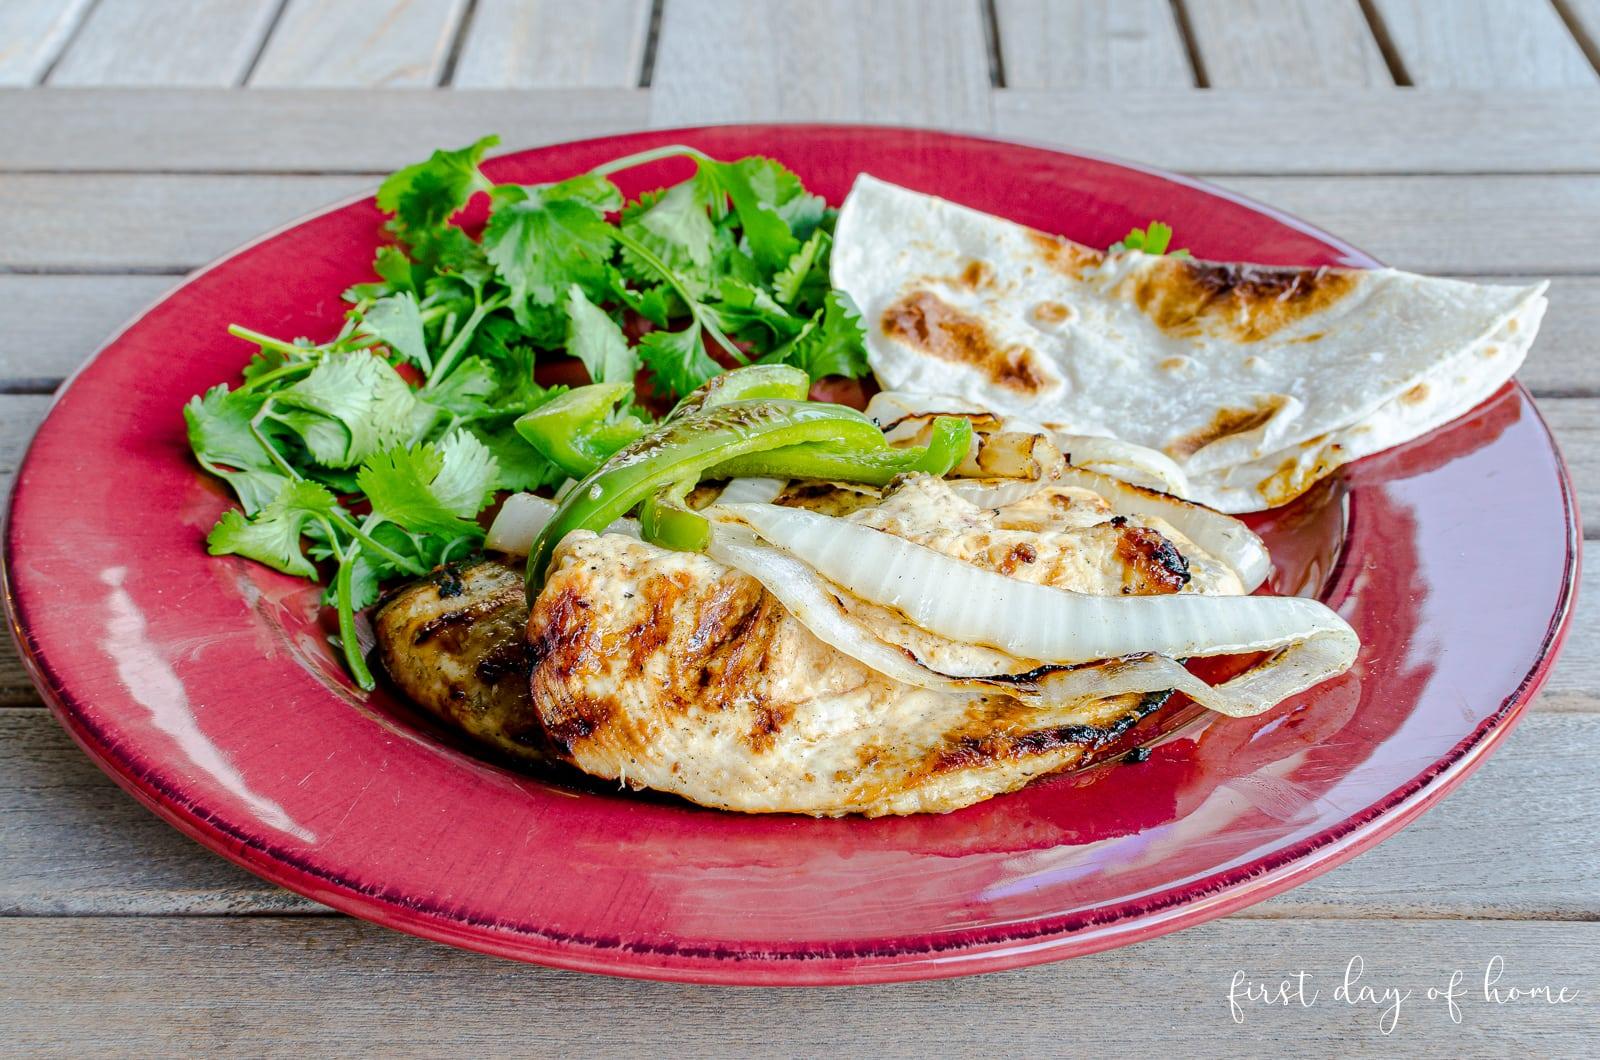 Authentic chicken fajita recipe served on plate with cilantrol garnish and flour tortilla